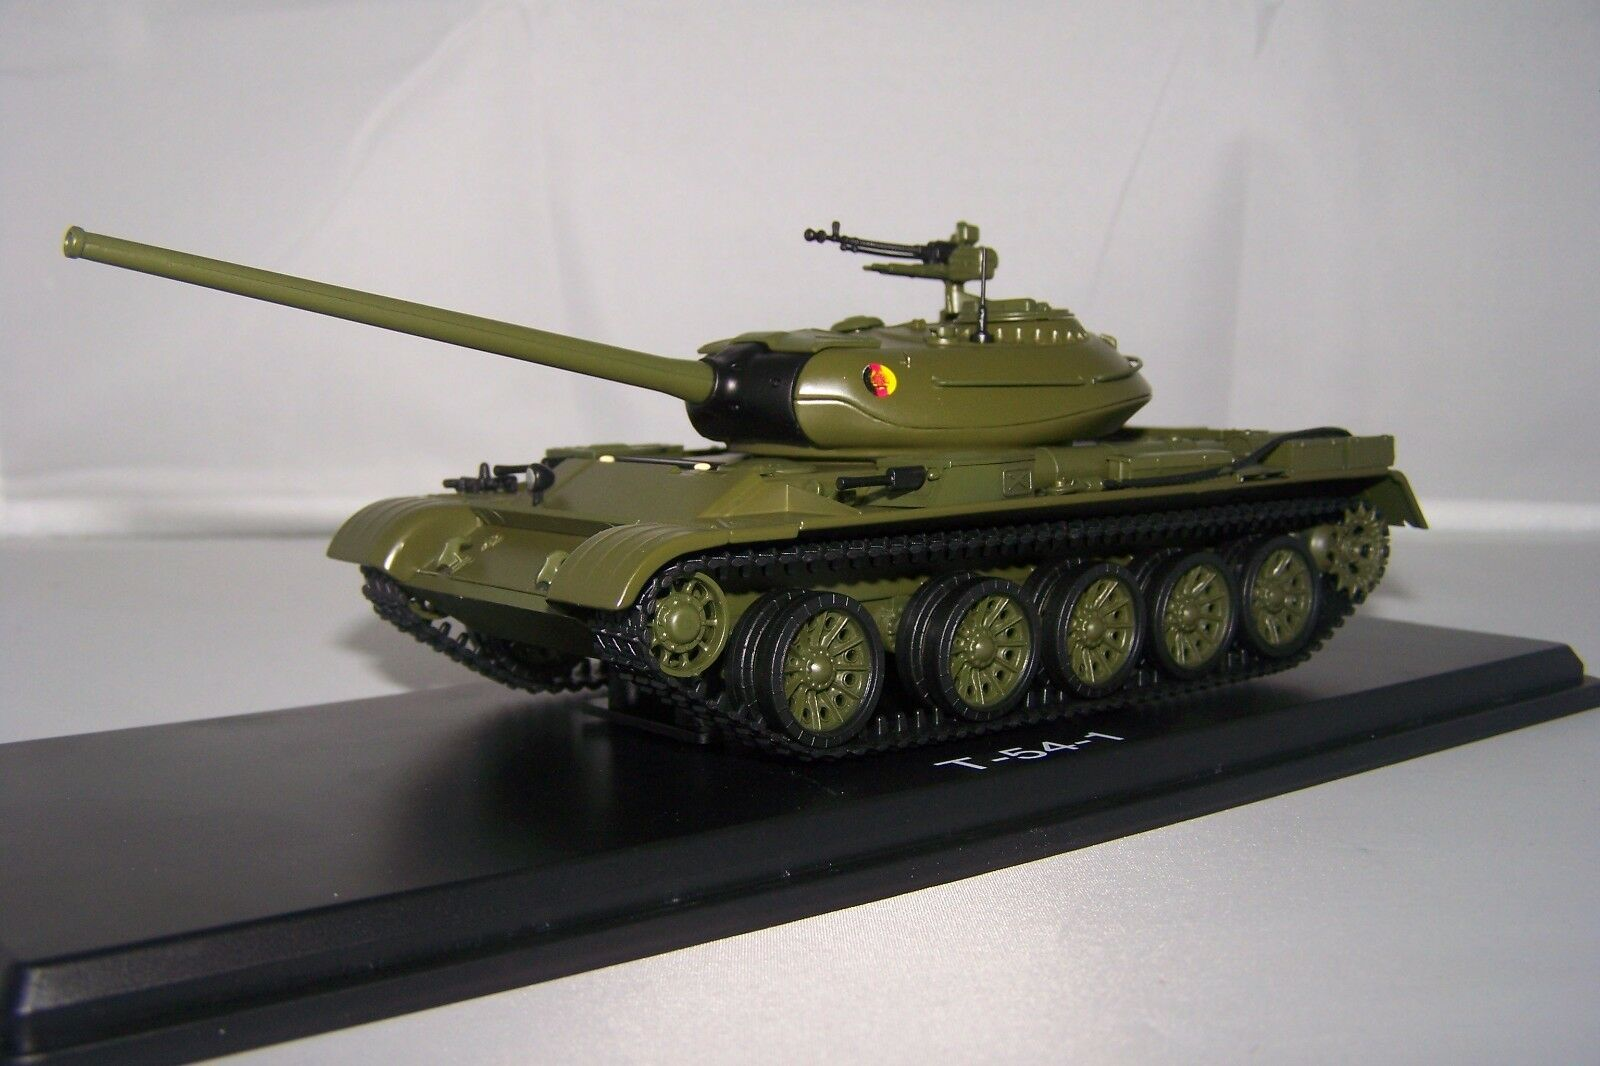 1/43 Militaire PremiumClassixxs  47027  T-54 char de la nva